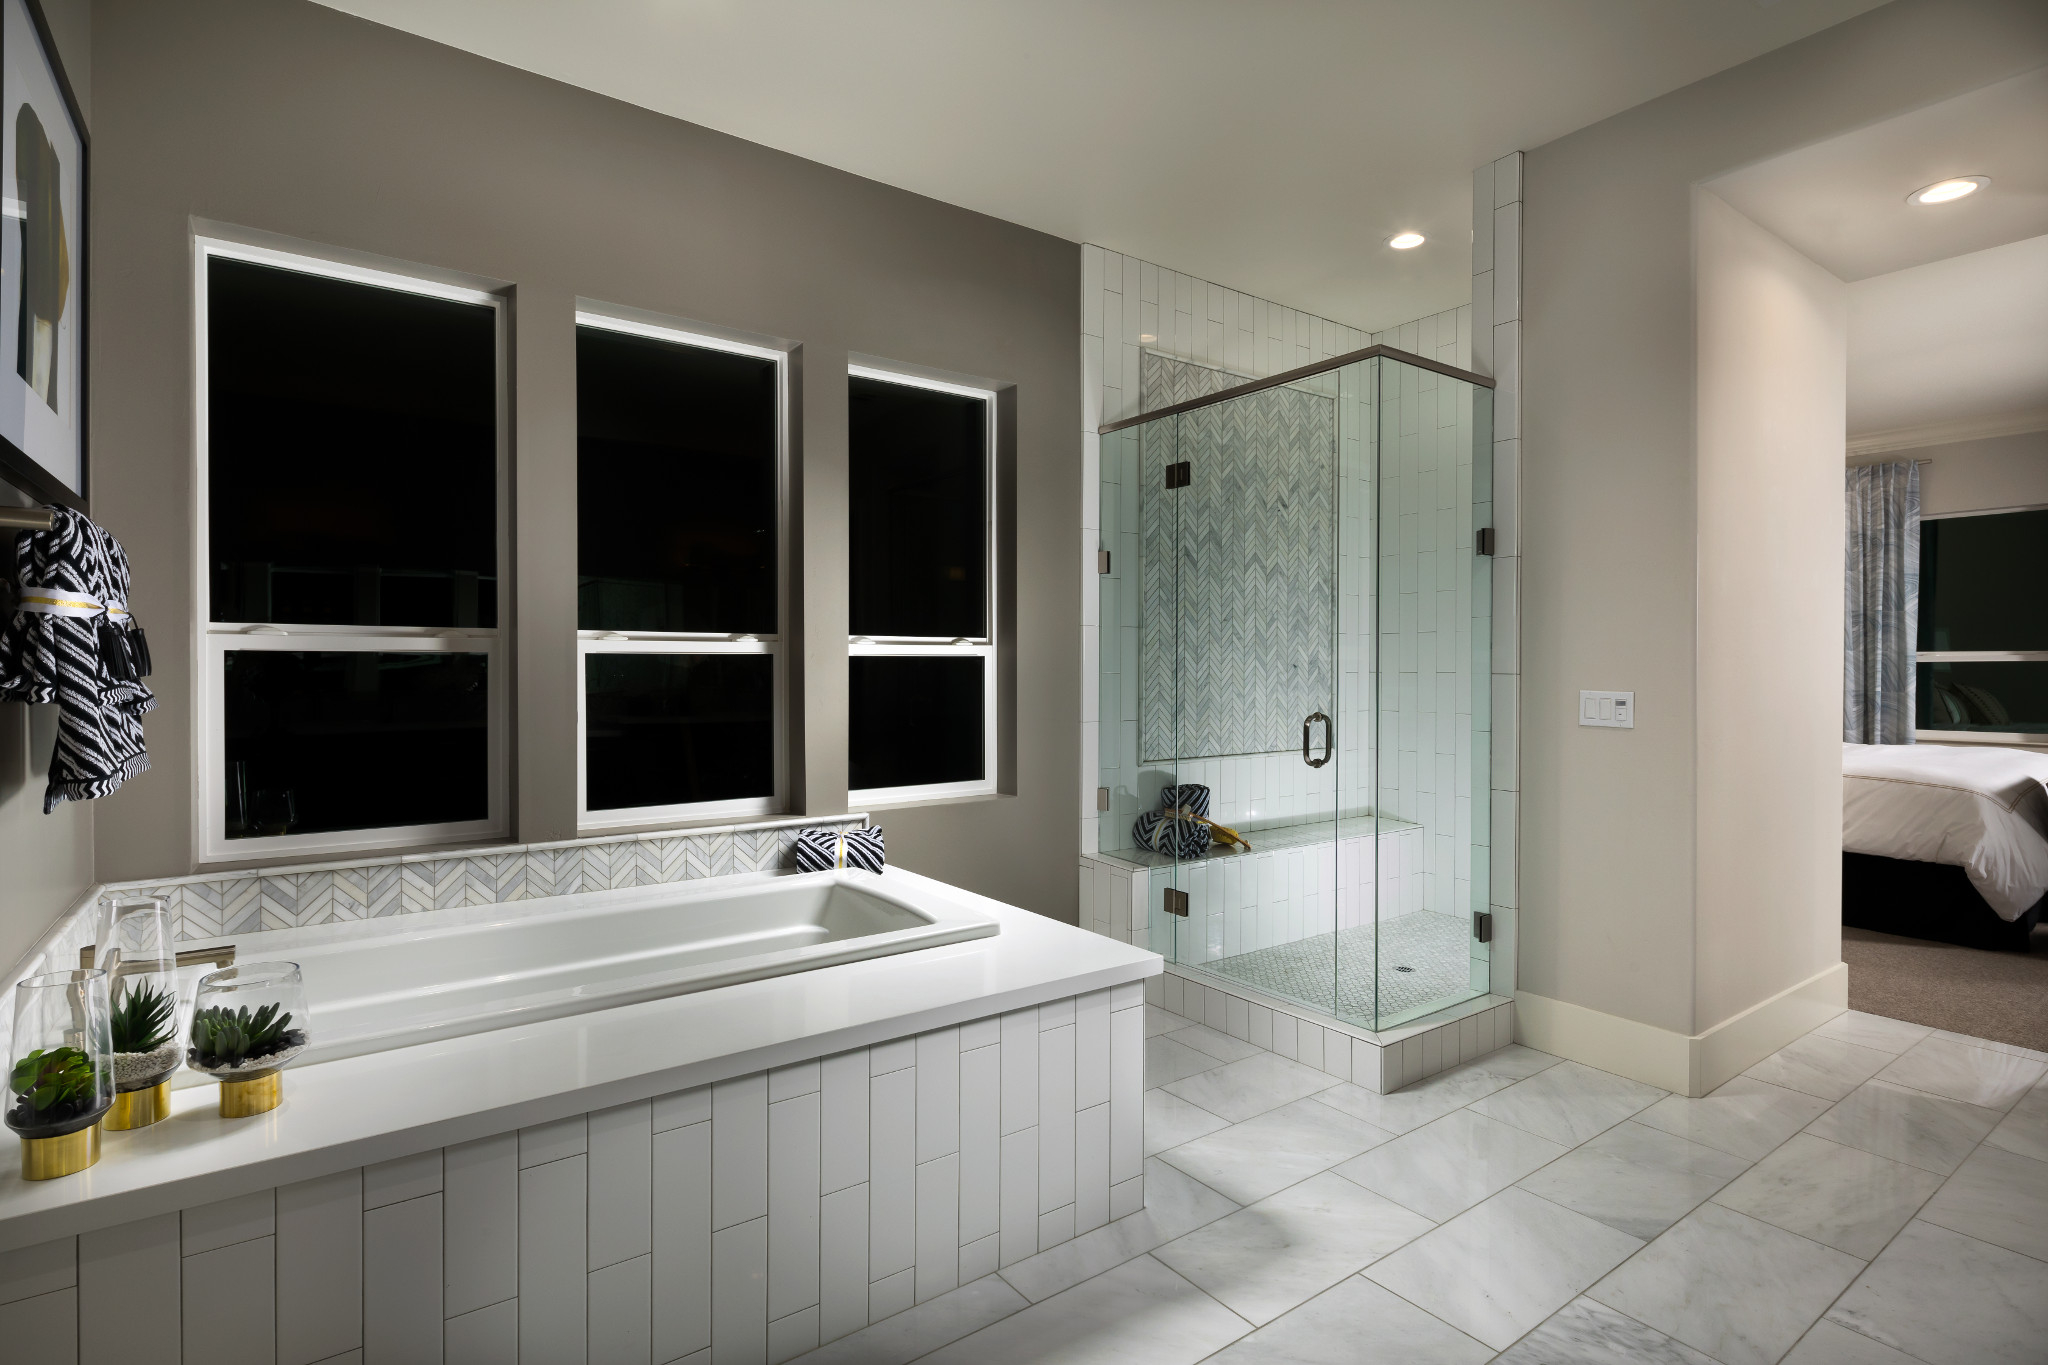 Trilogy Monarch Dunes Carmel Master Bath